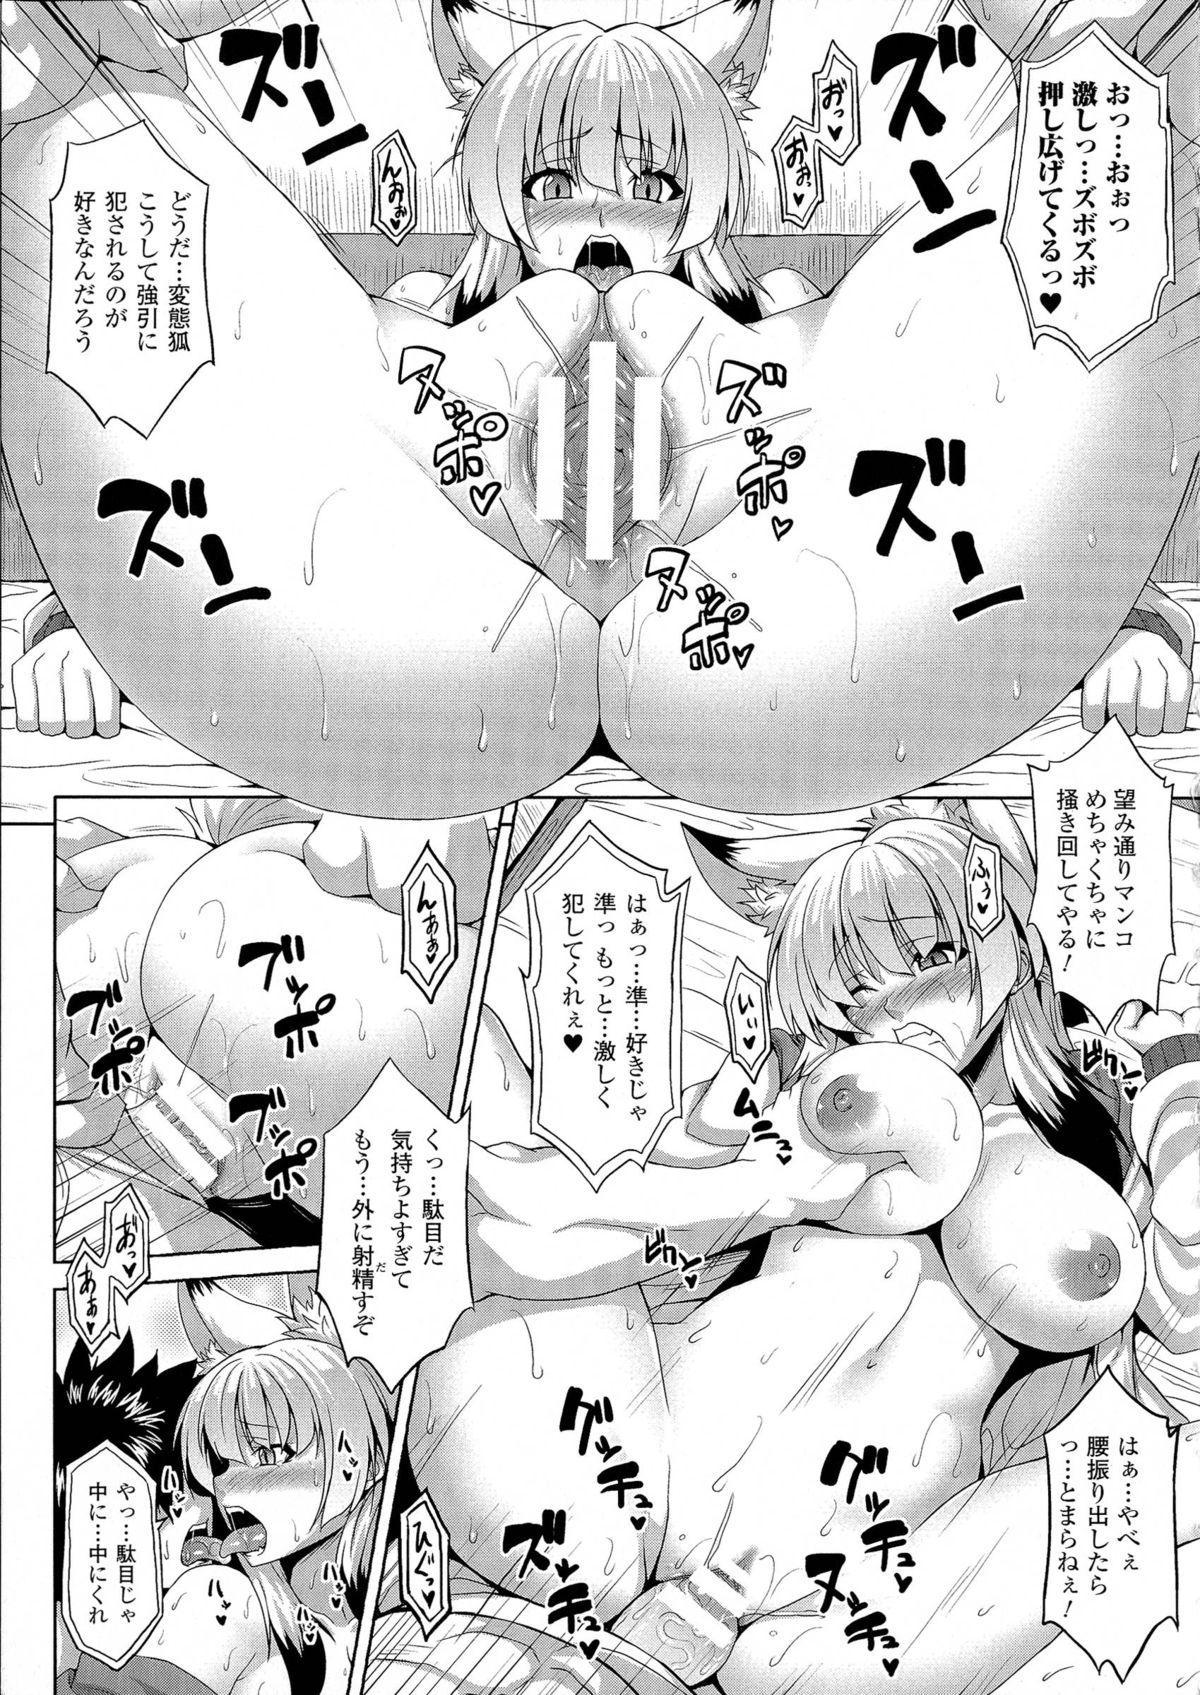 Angel Fall: Tengoku e to Ochiru Otome-tachi 168